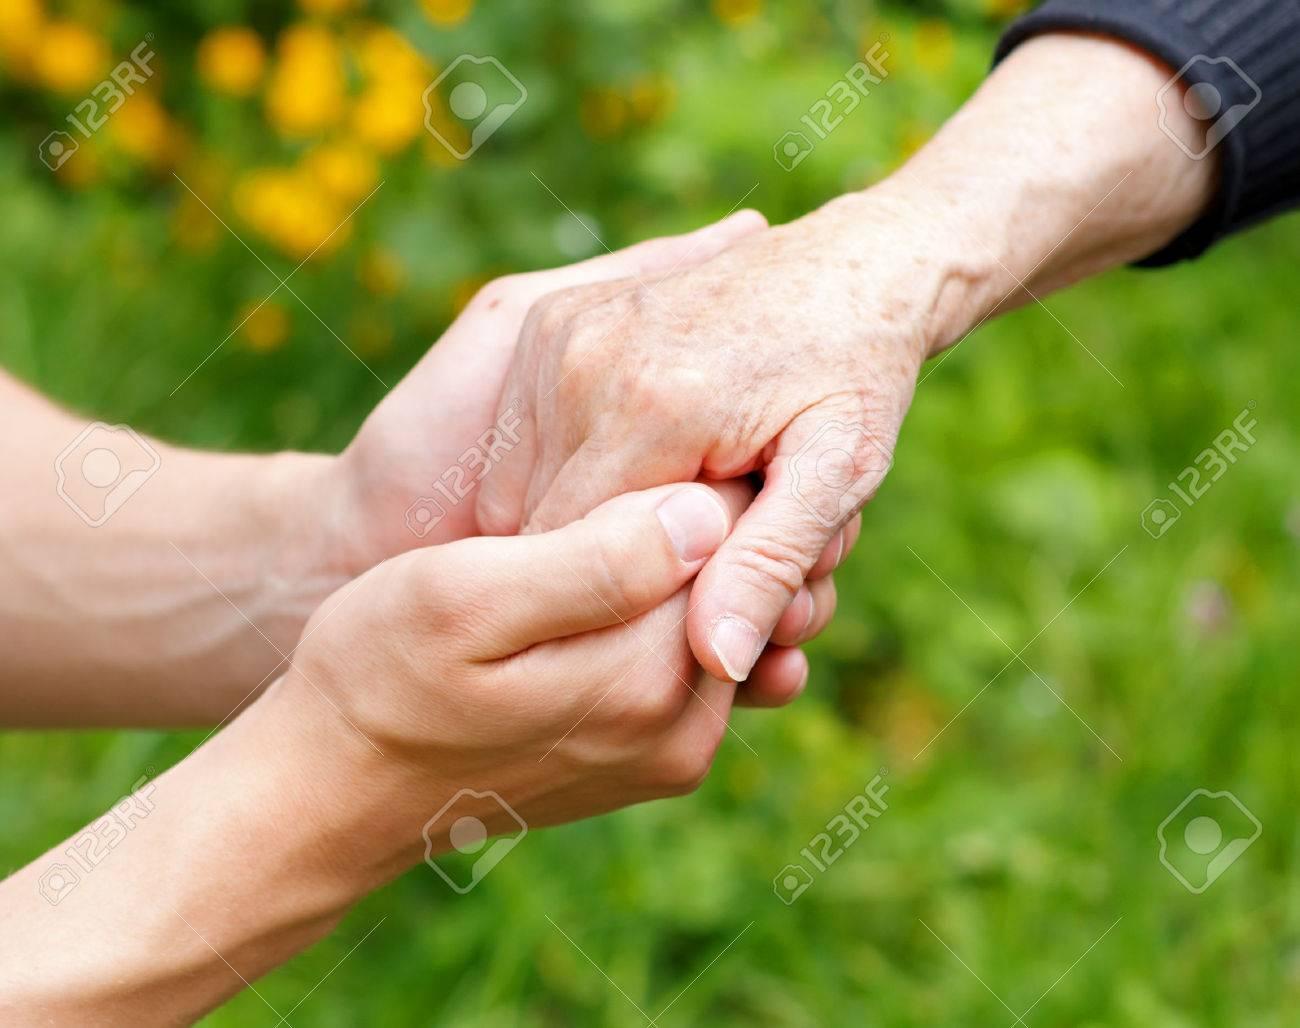 Doctor's hand holding a wrinkled elderly hand - 27901415